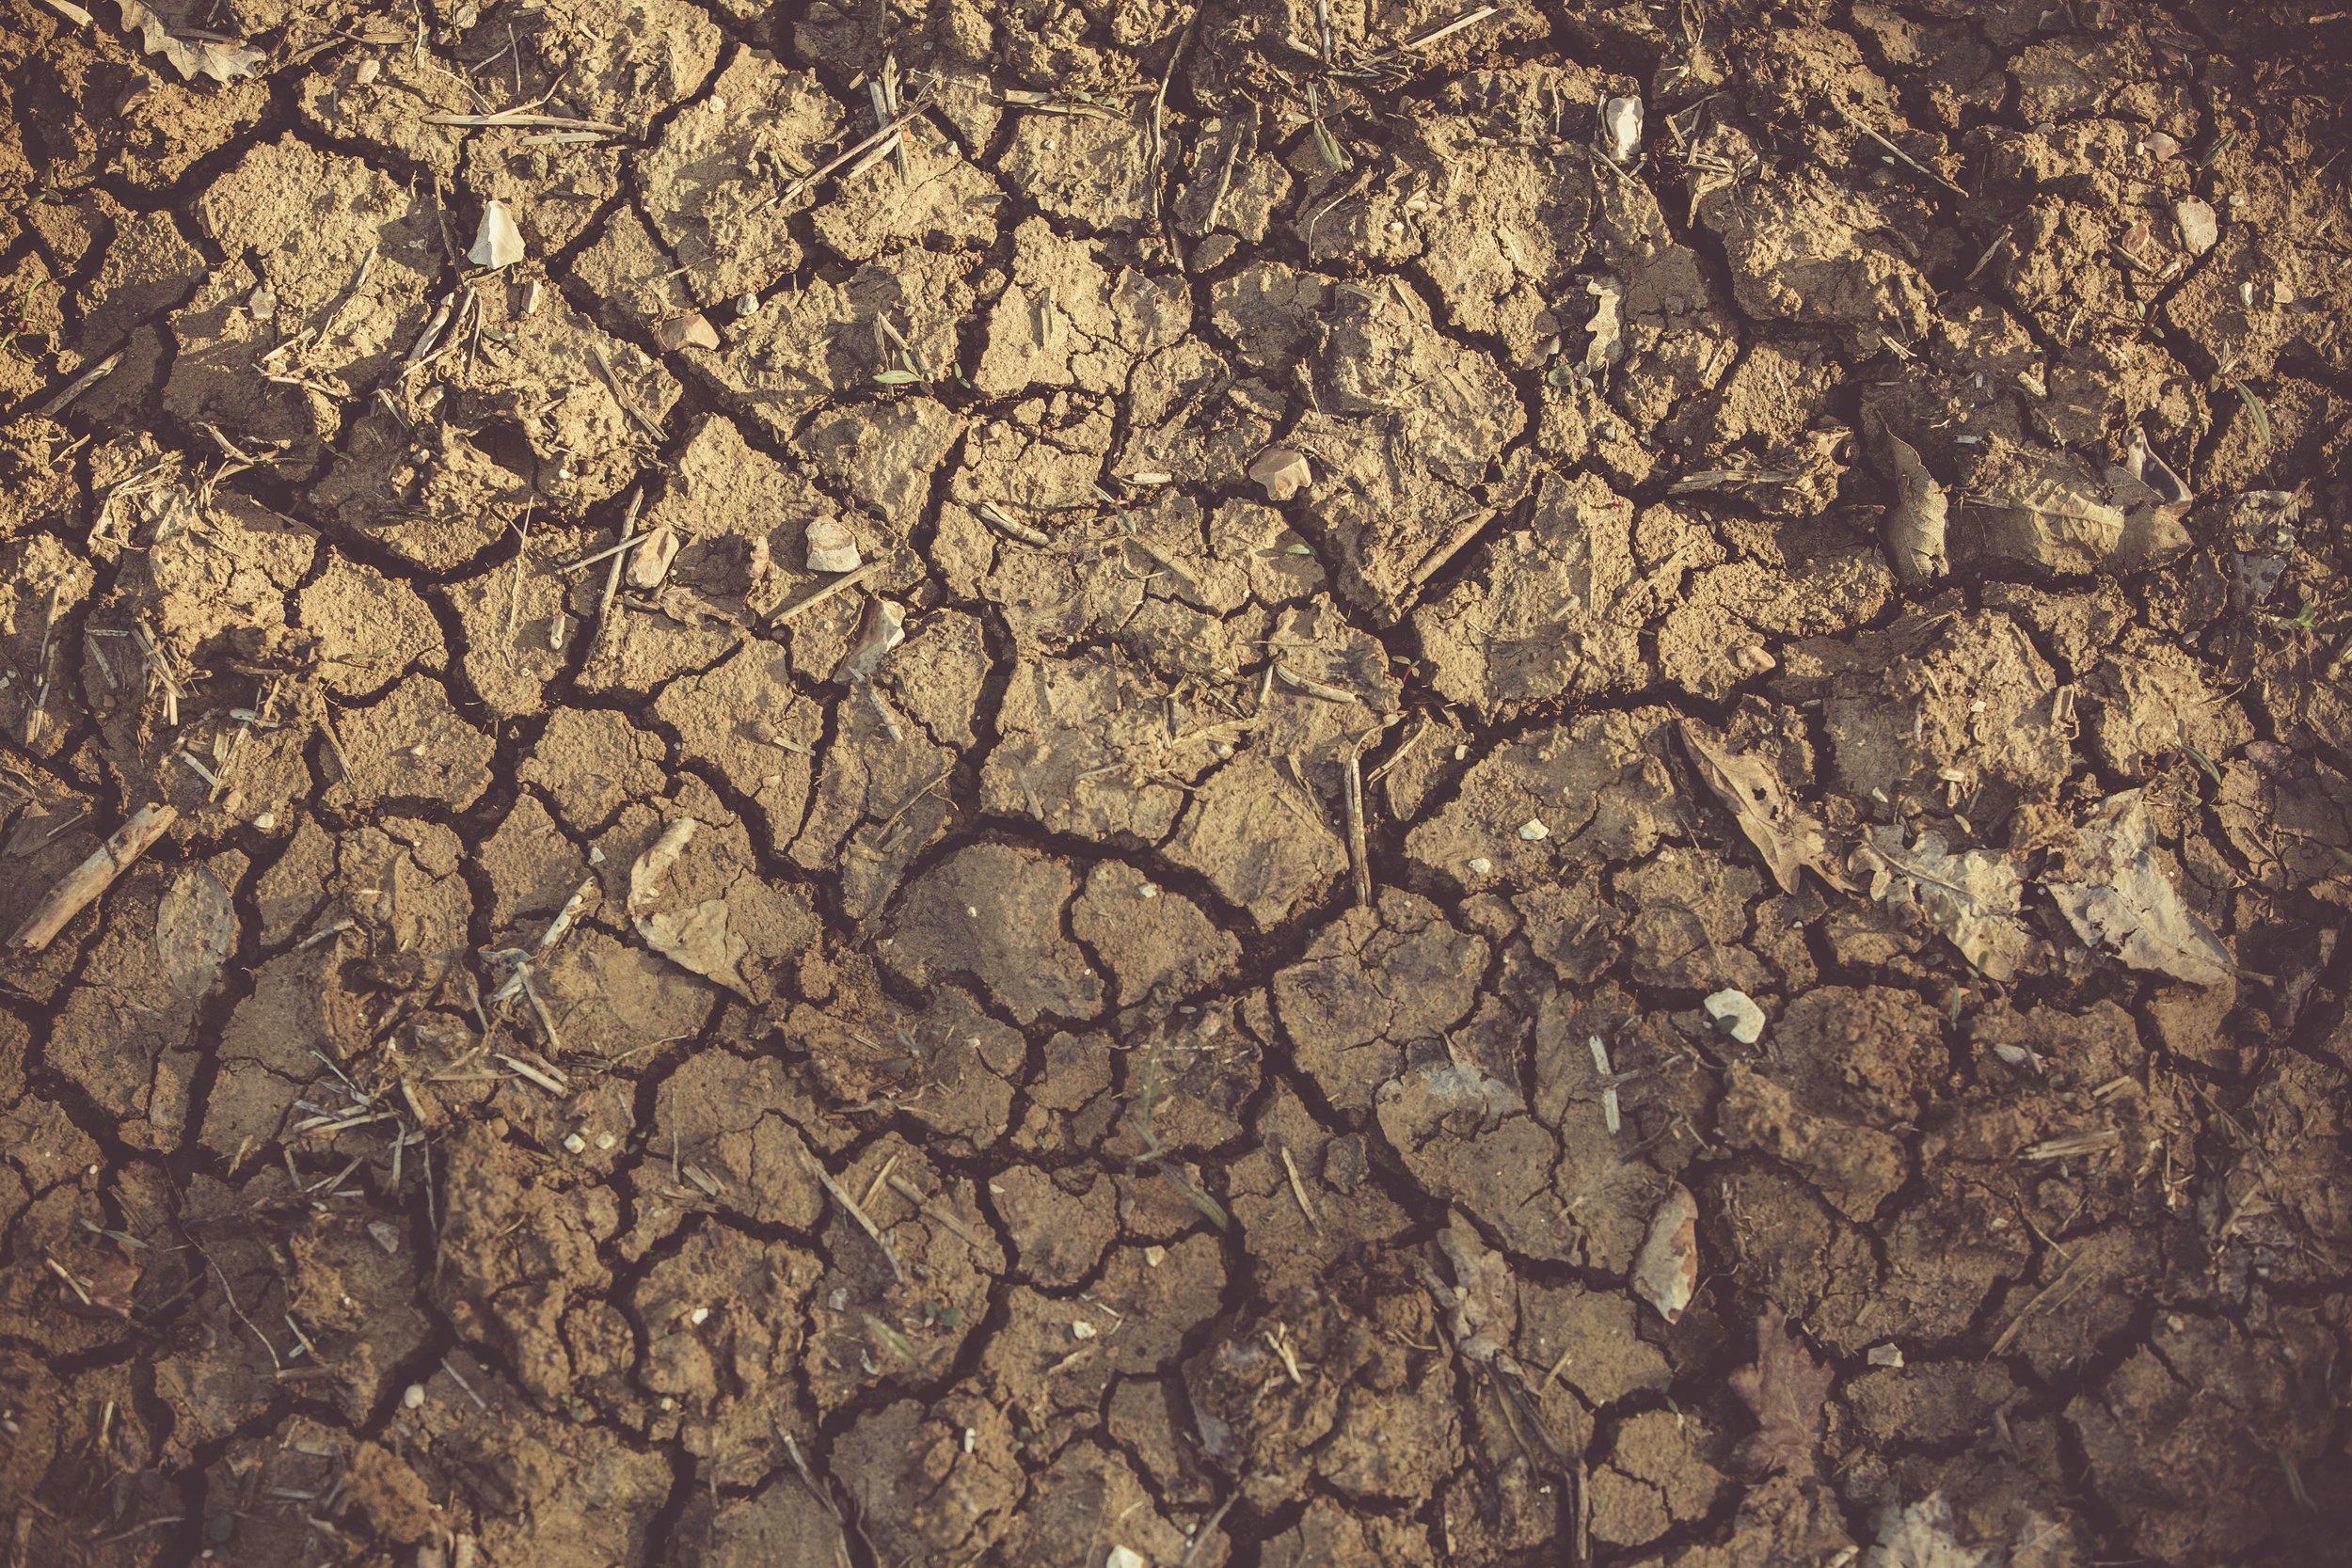 arid-clay-close-up-1097016.jpg